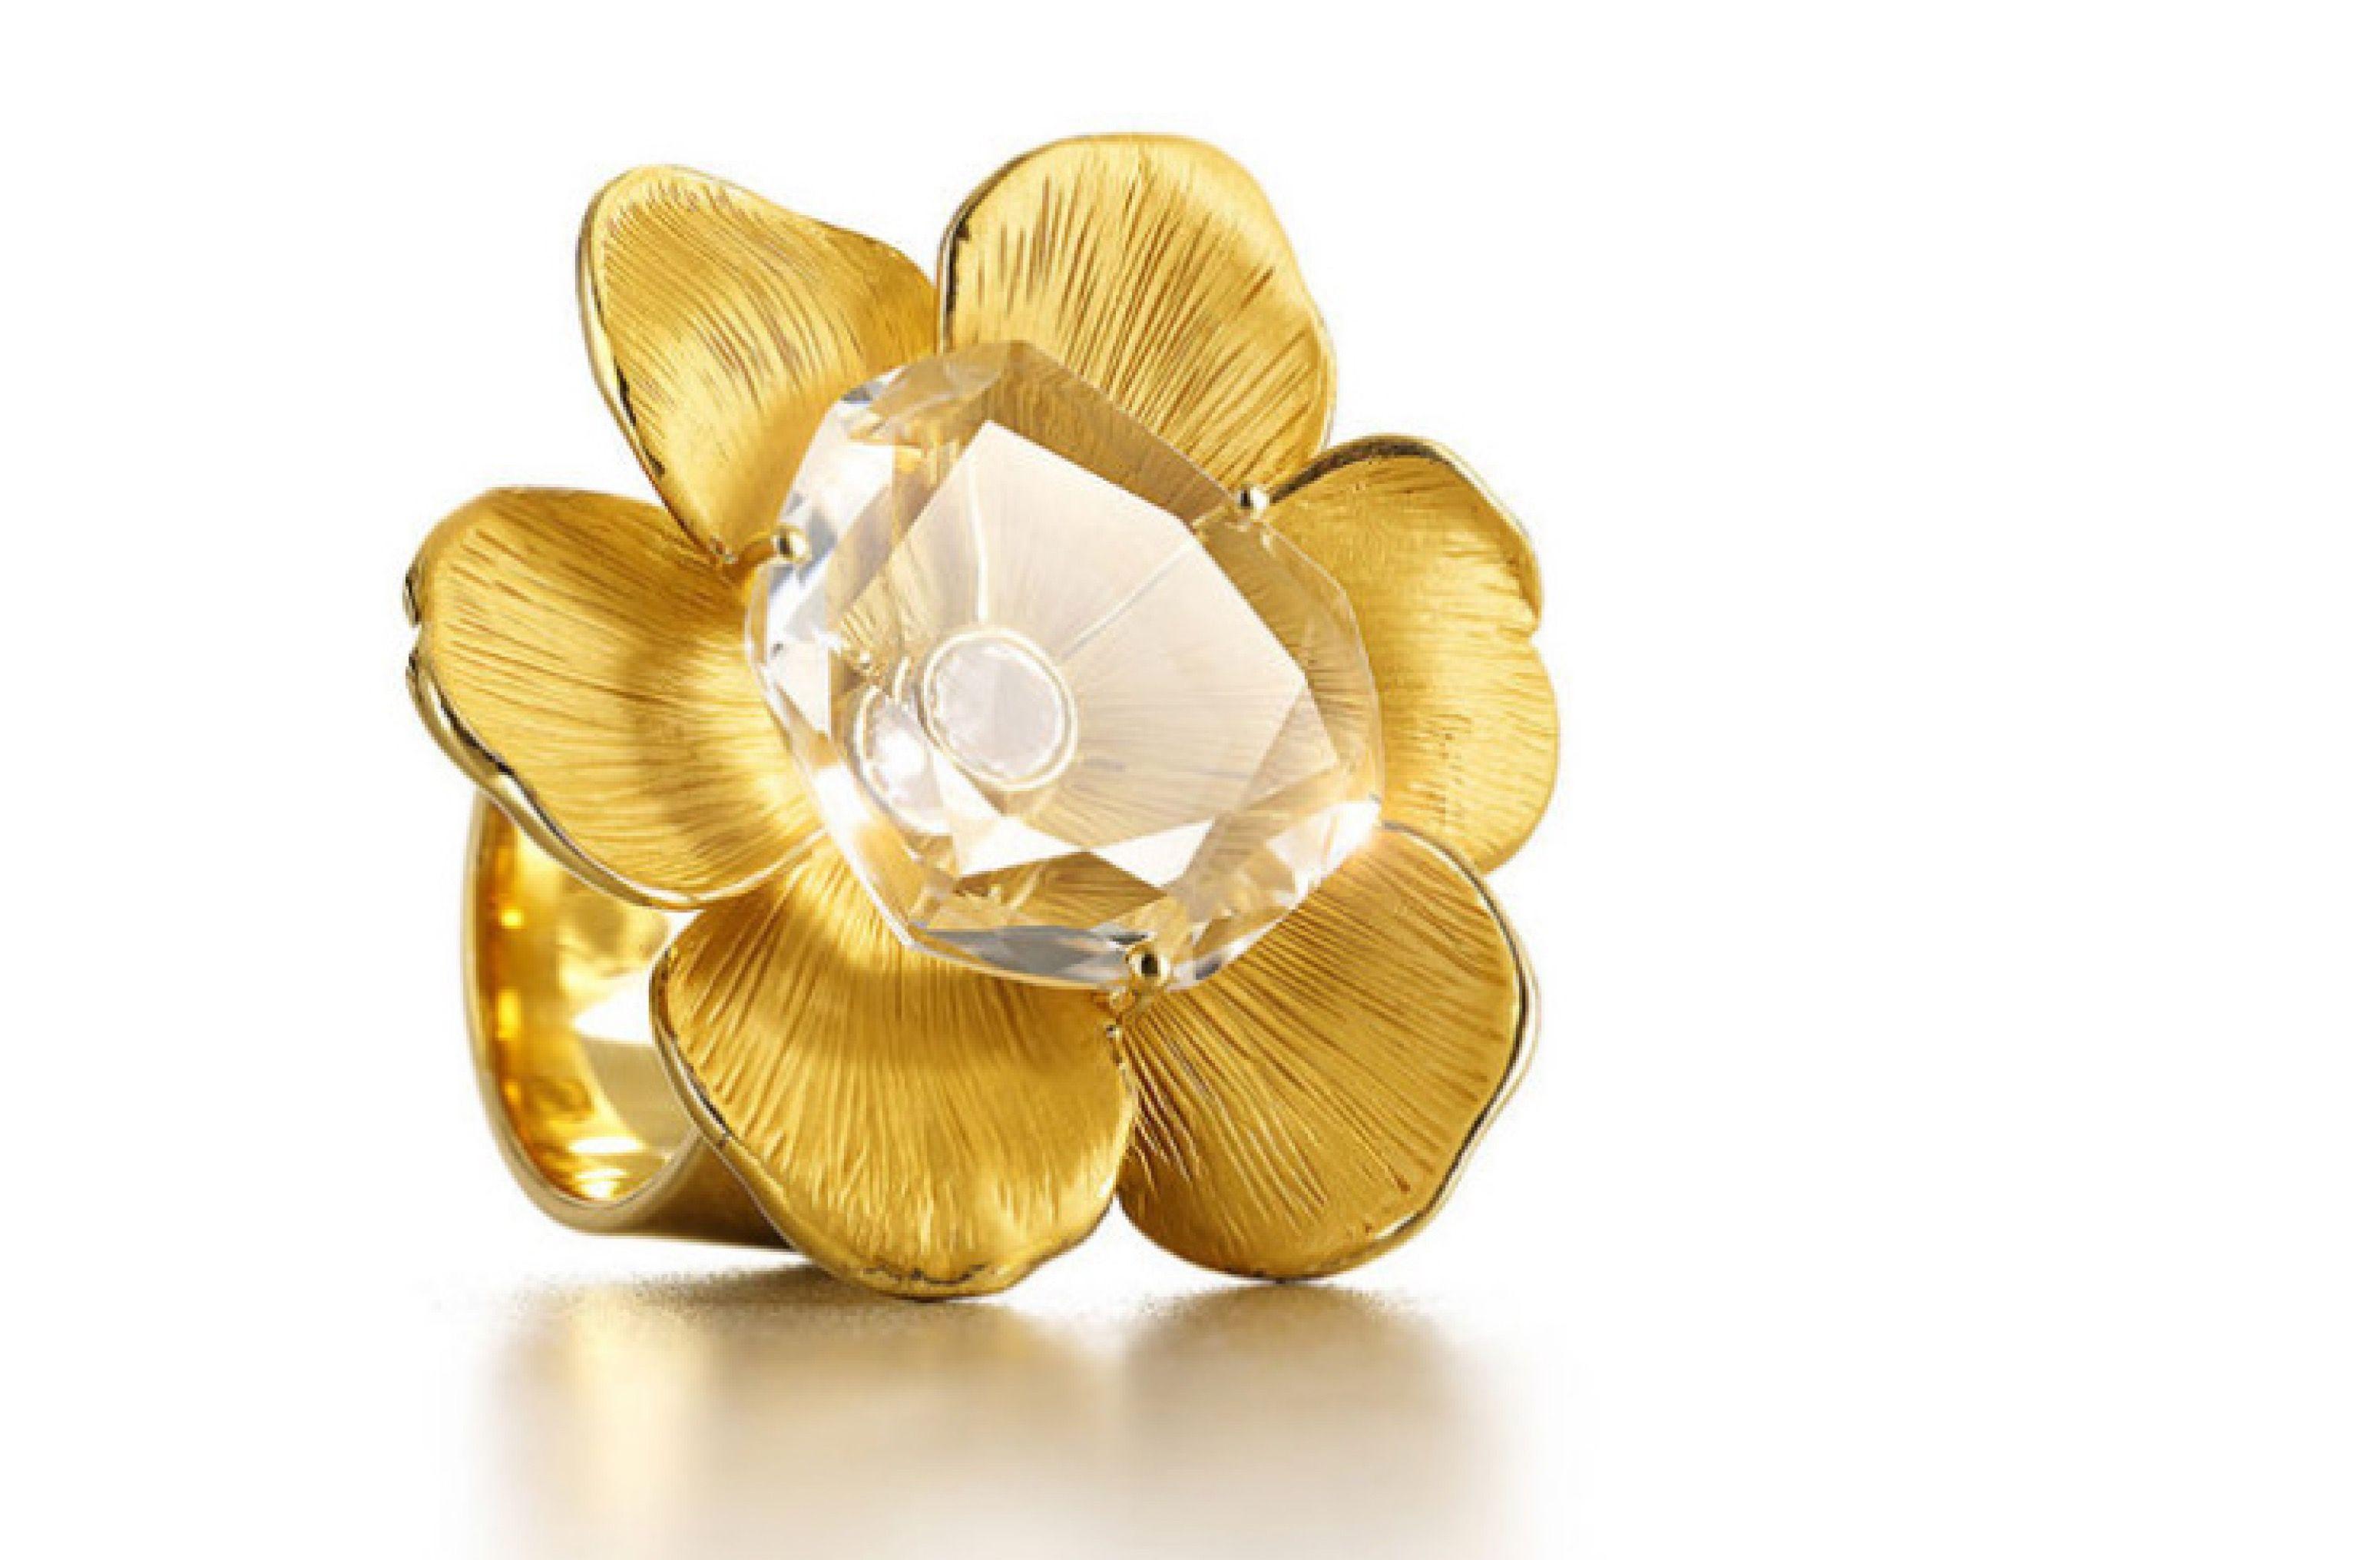 JewelryWhite_07.jpg